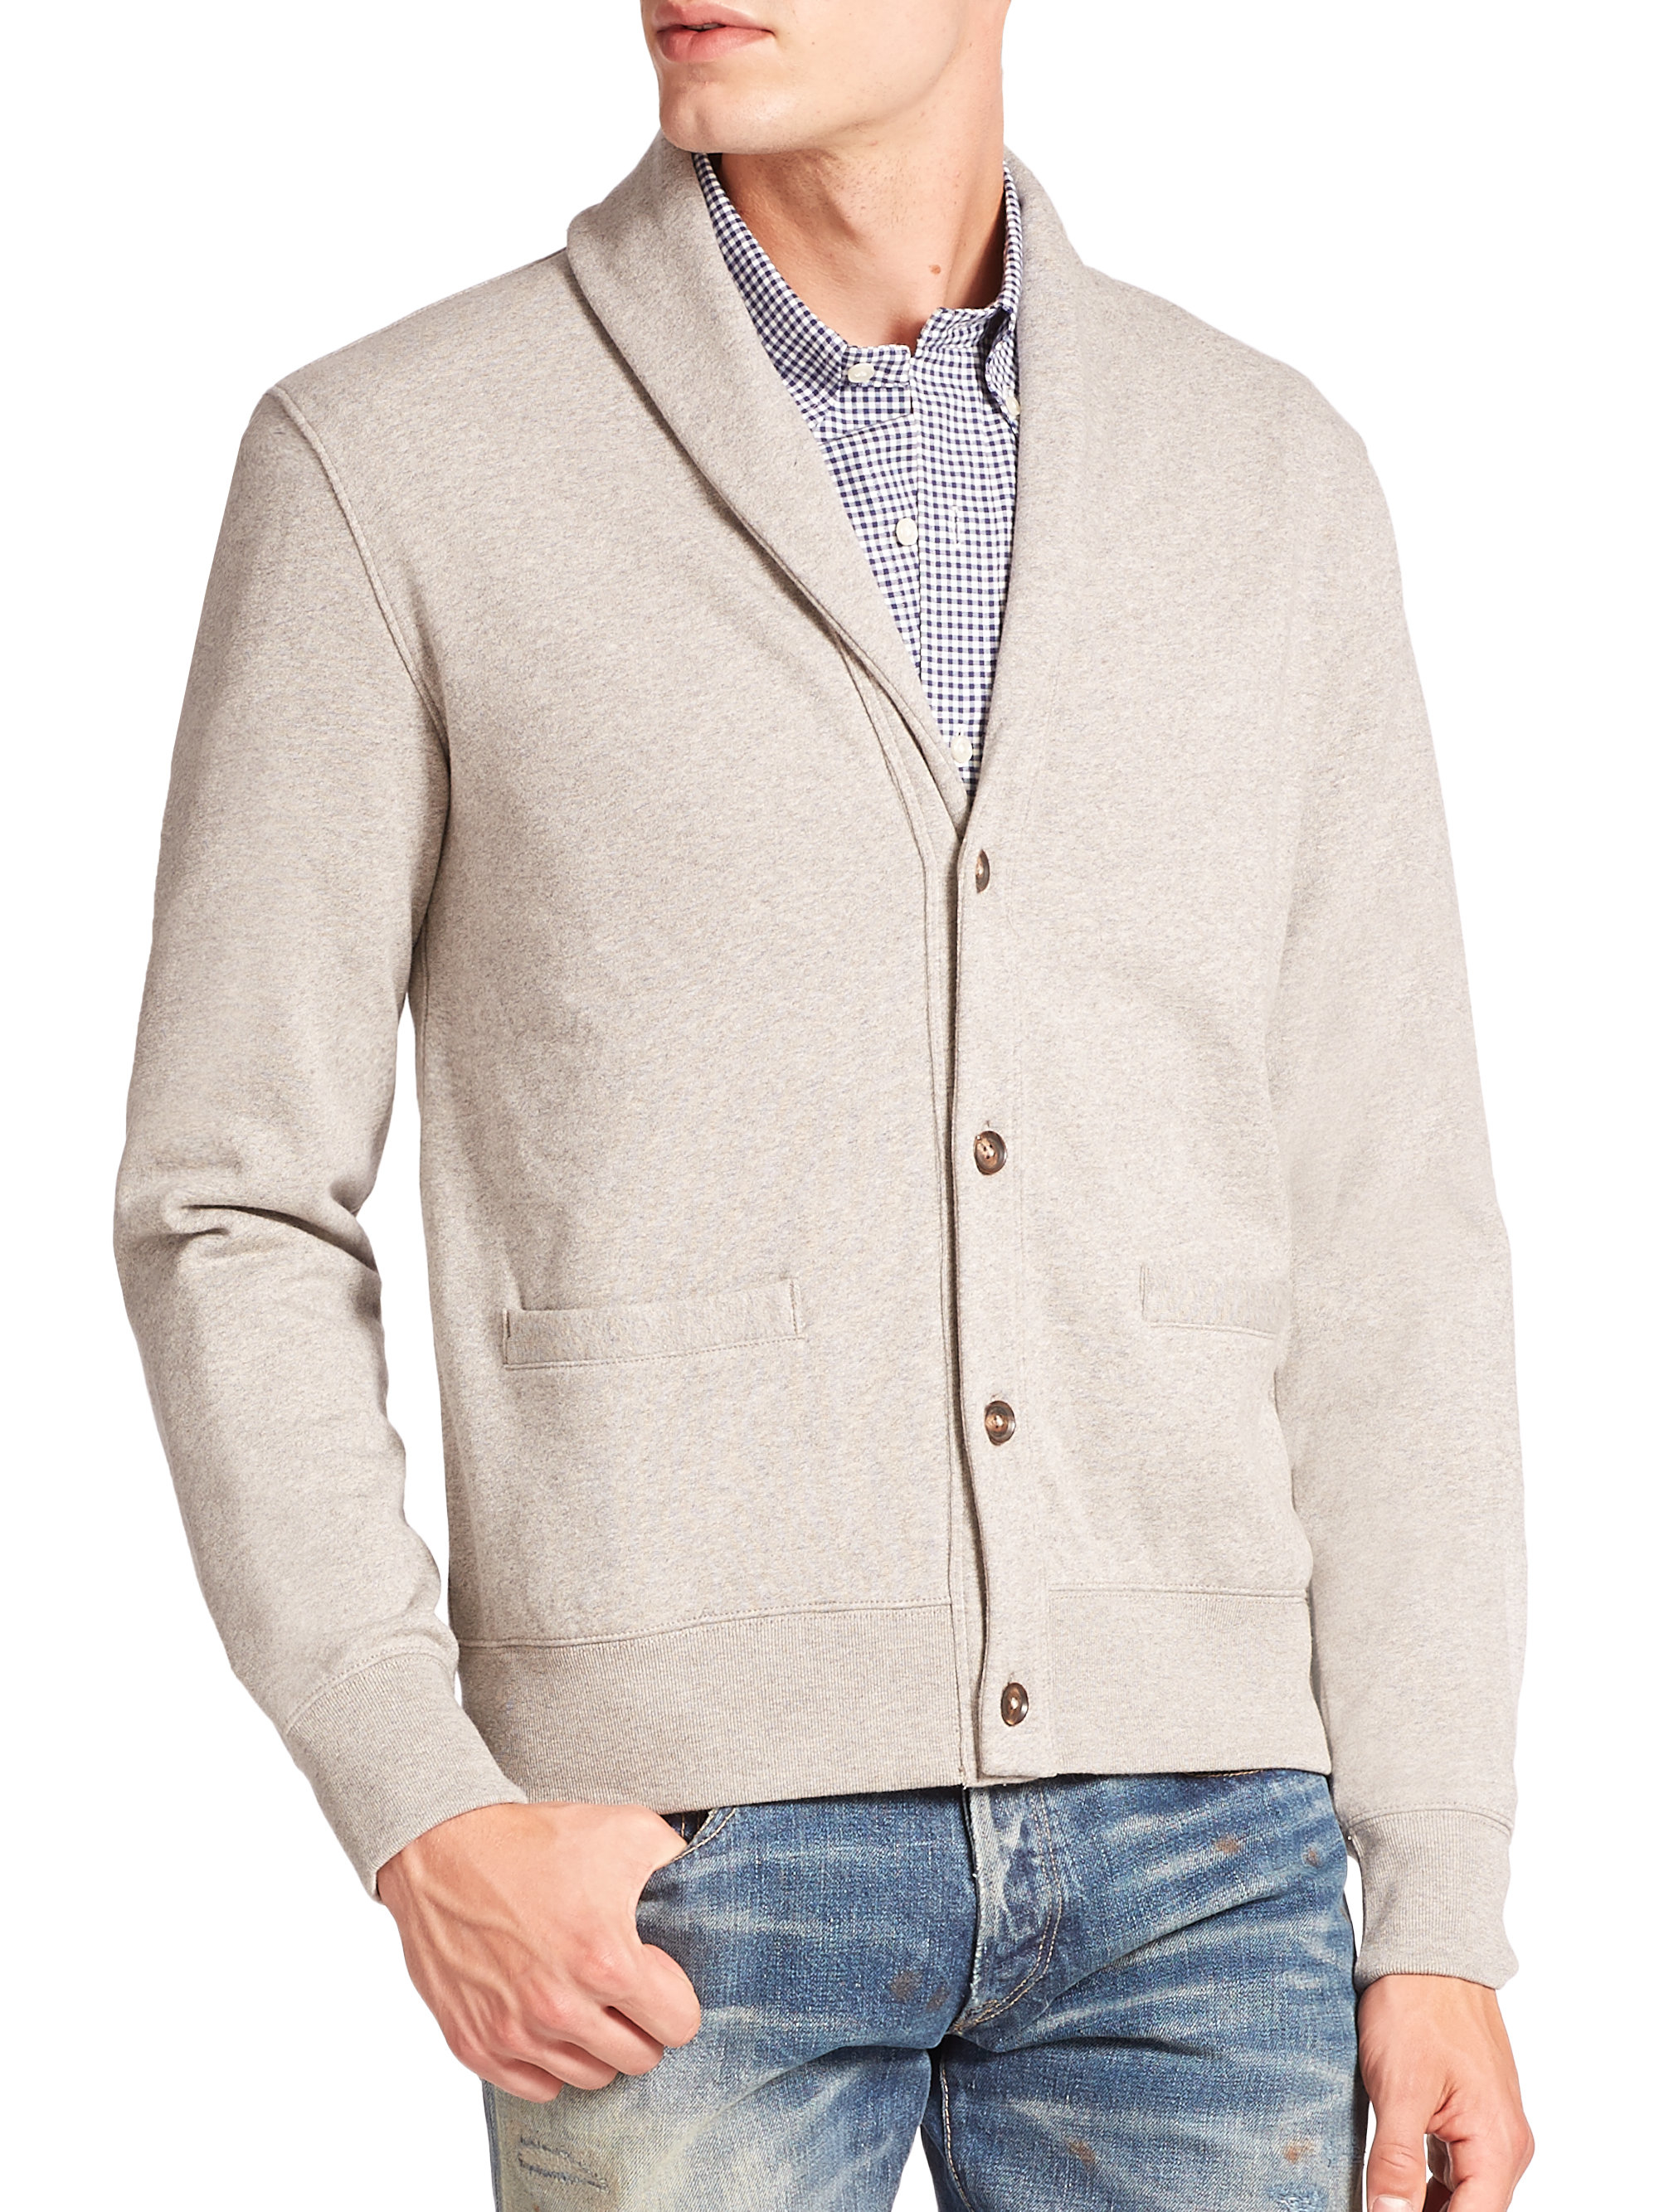 Polo ralph lauren Shawl Collar Fleece Cardigan in Gray for Men | Lyst